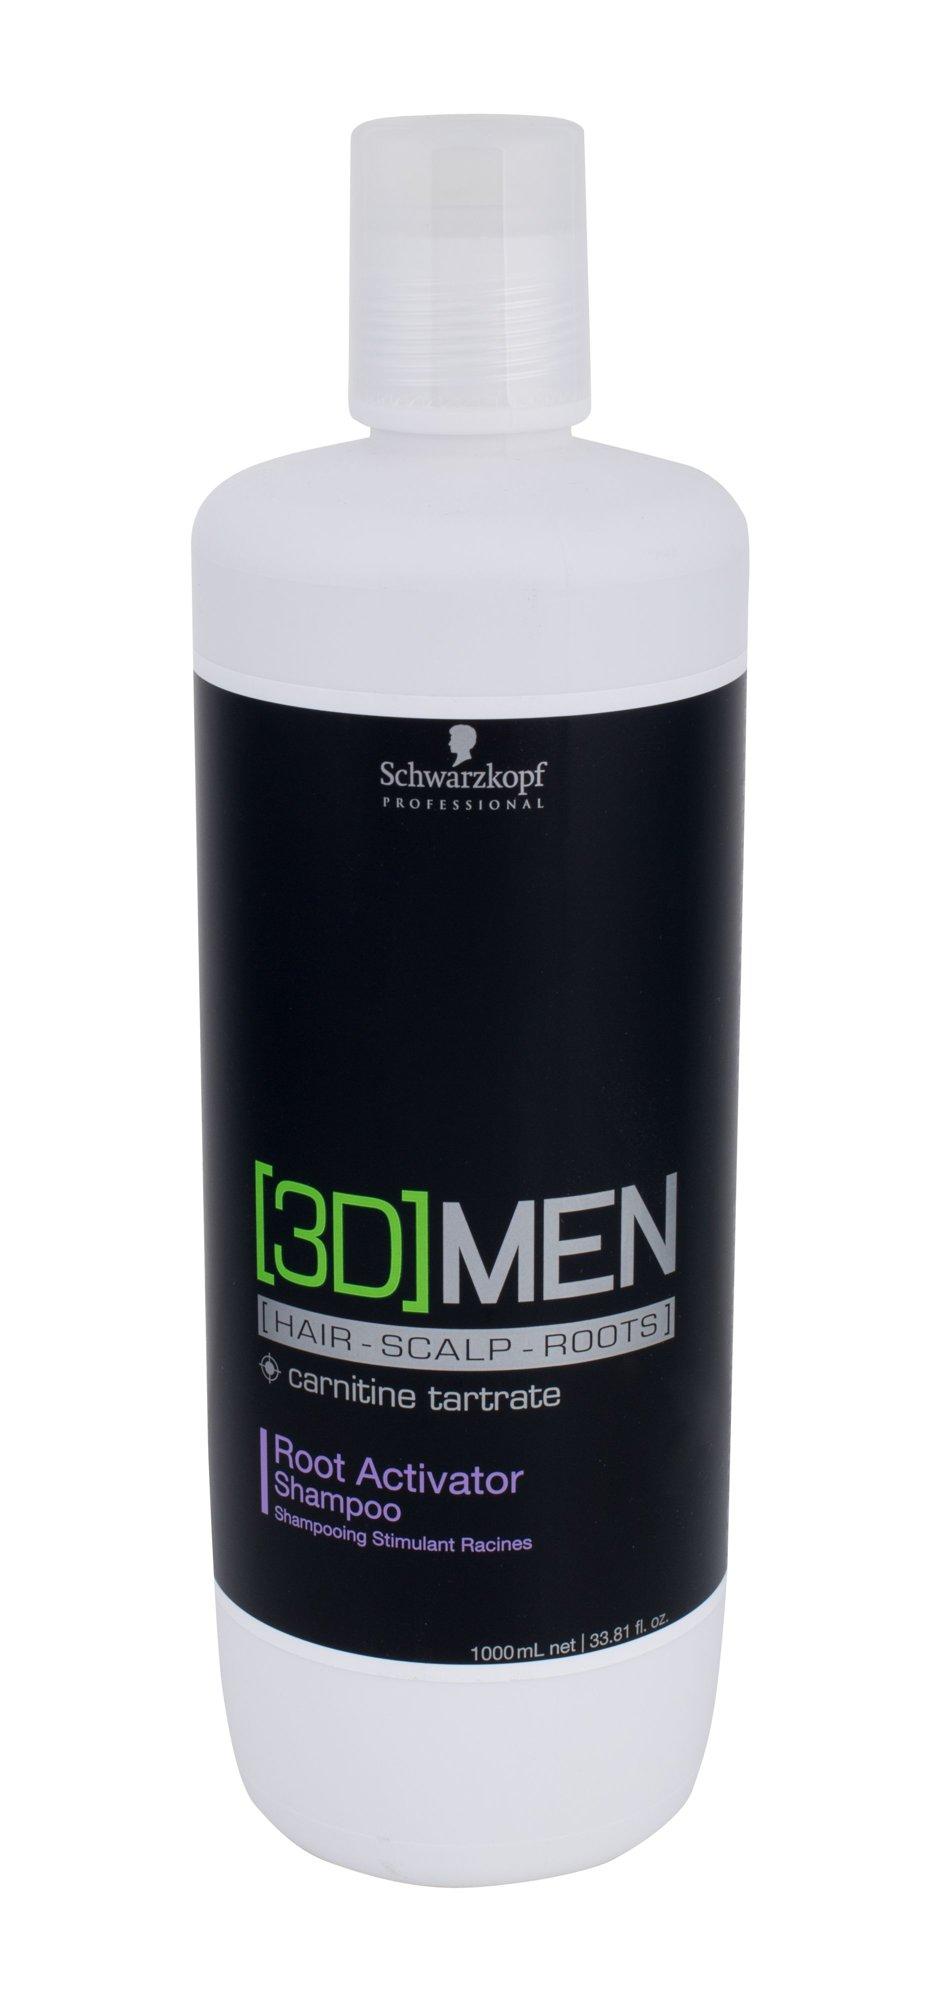 Schwarzkopf 3DMEN Cosmetic 1000ml